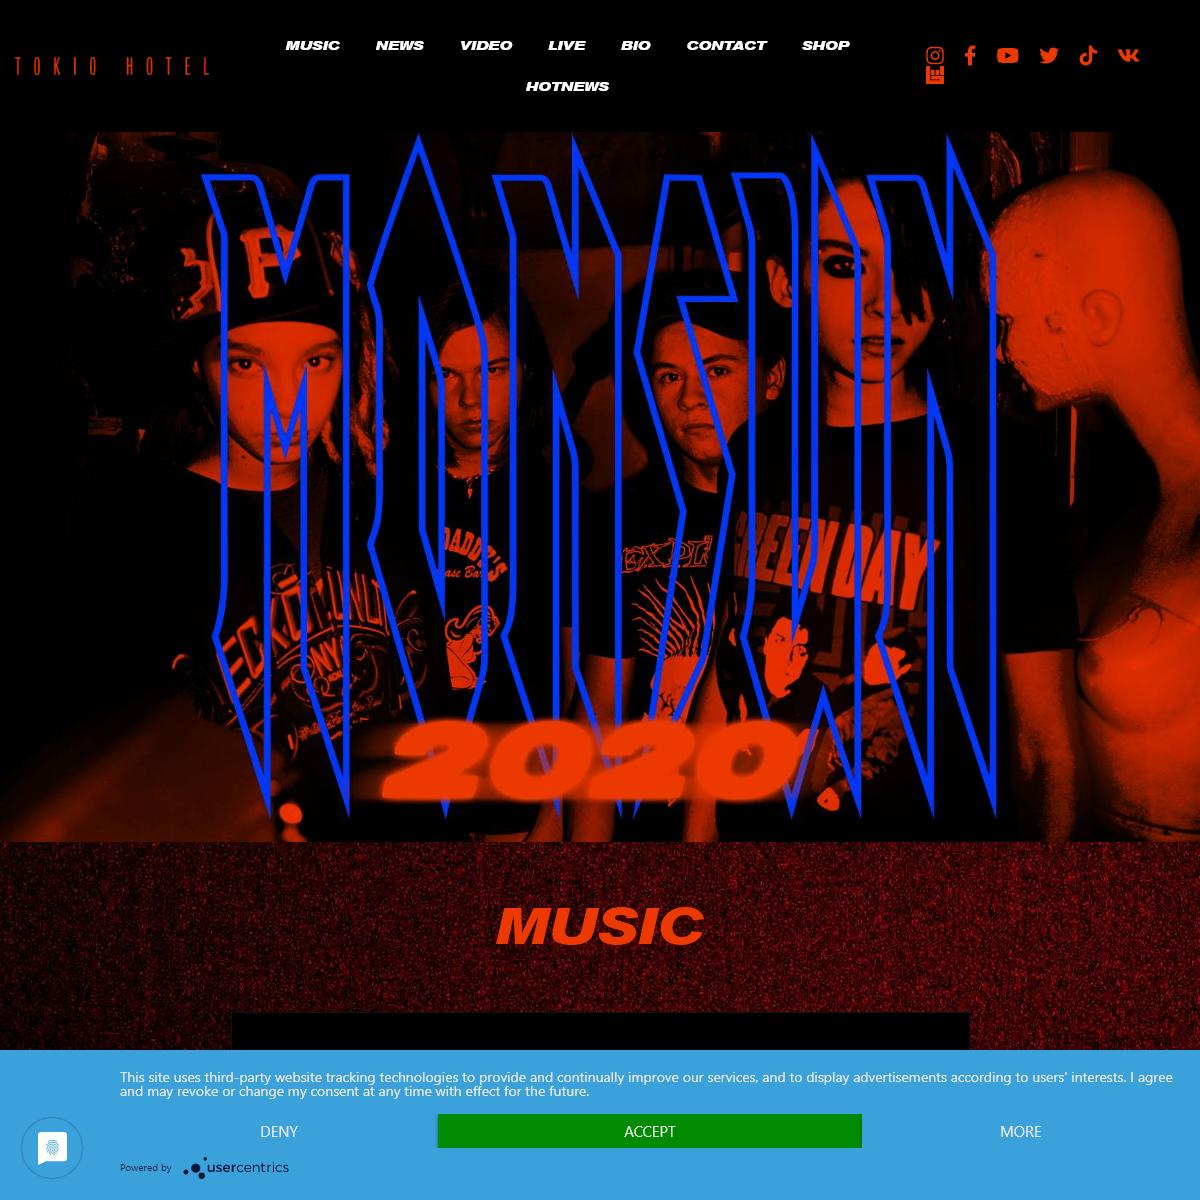 Tokio Hotel - Monsoon 2020